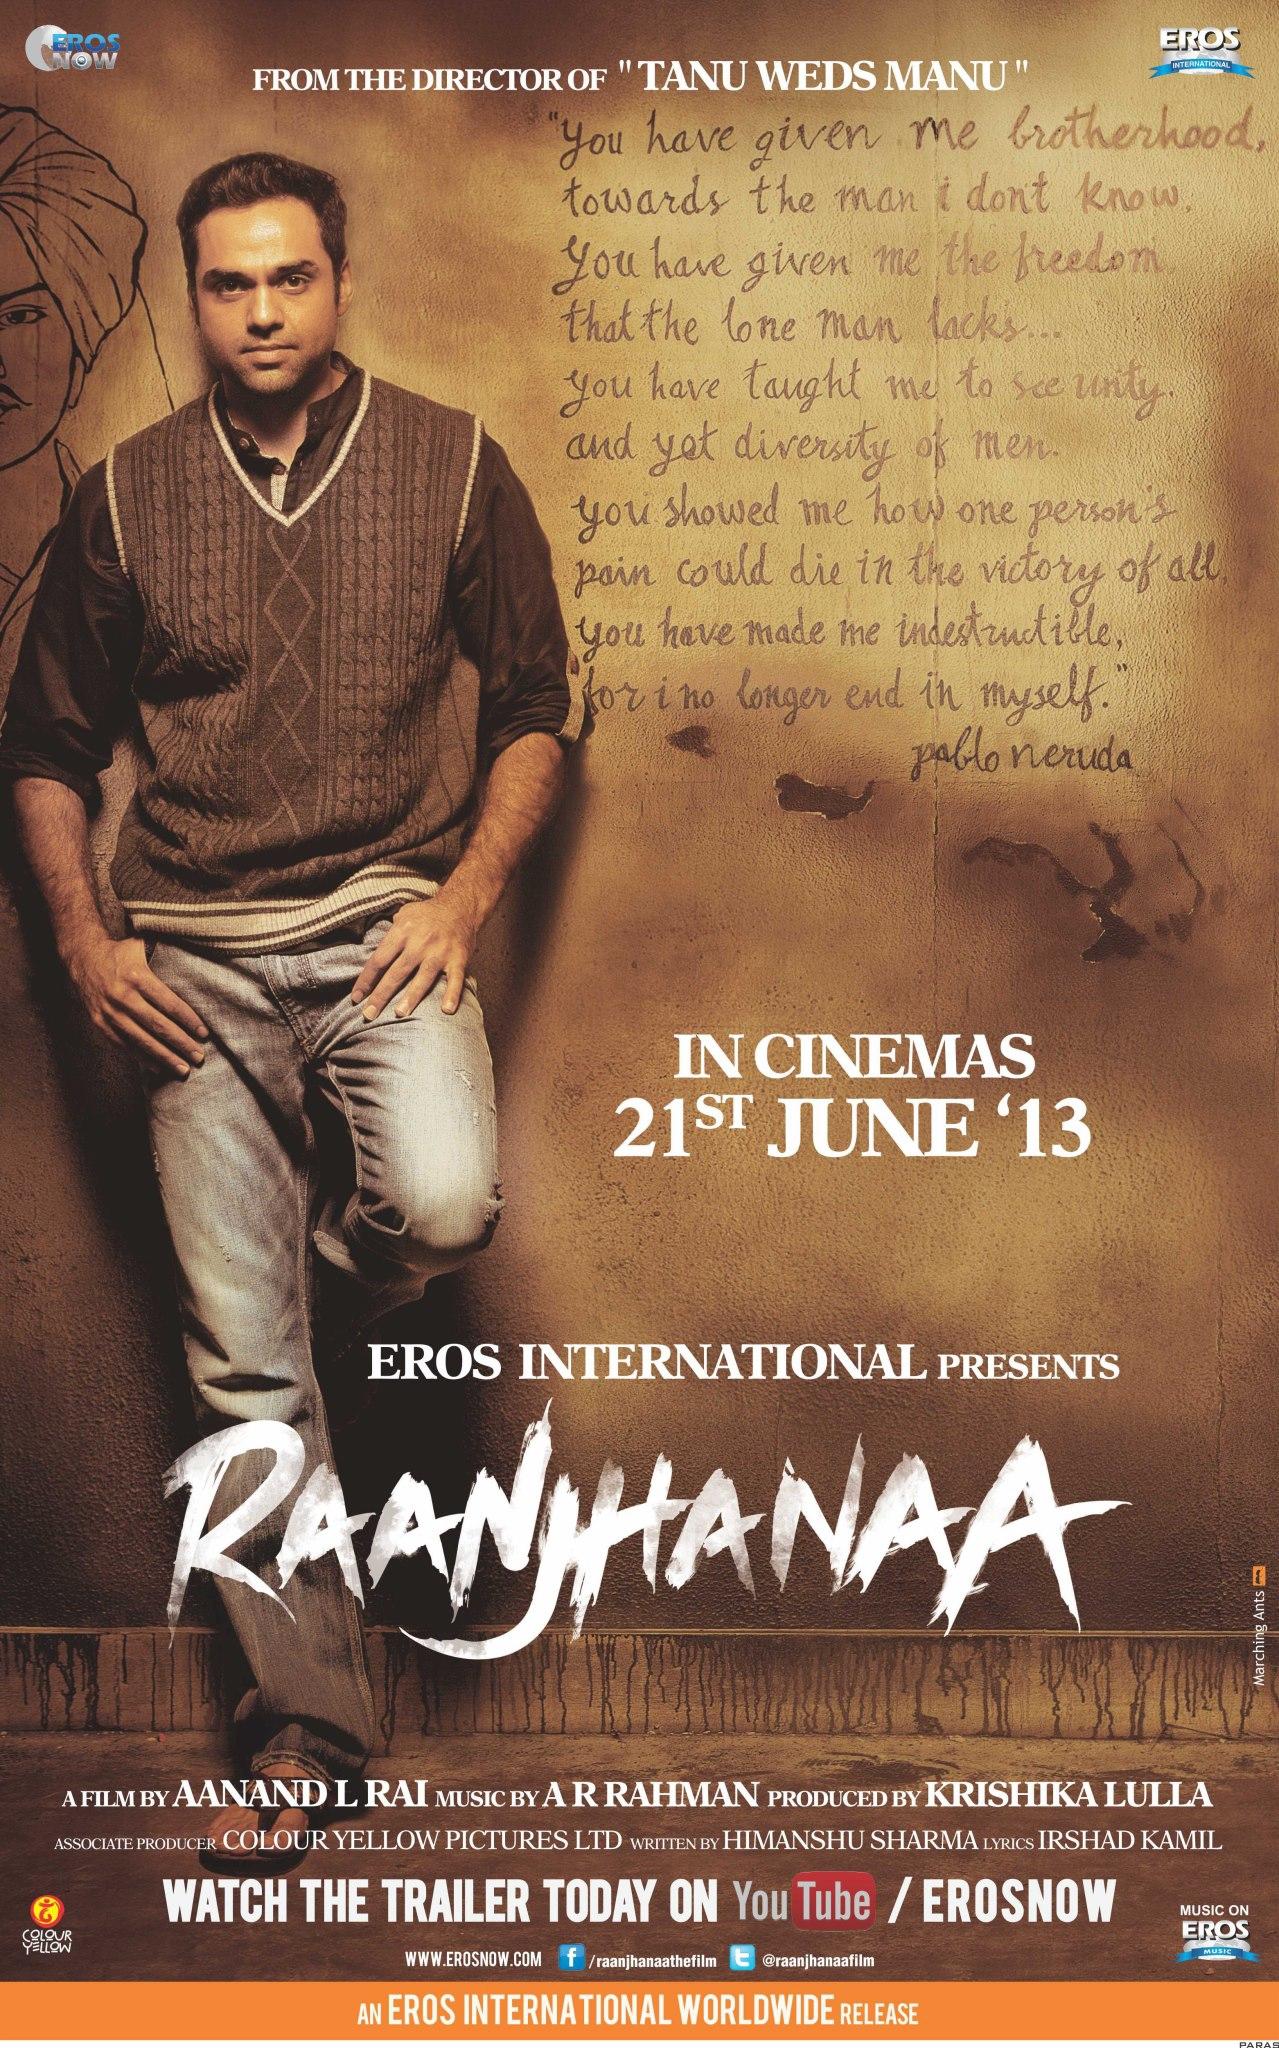 Raanjhanaa - Movie Poster #2 (Original)